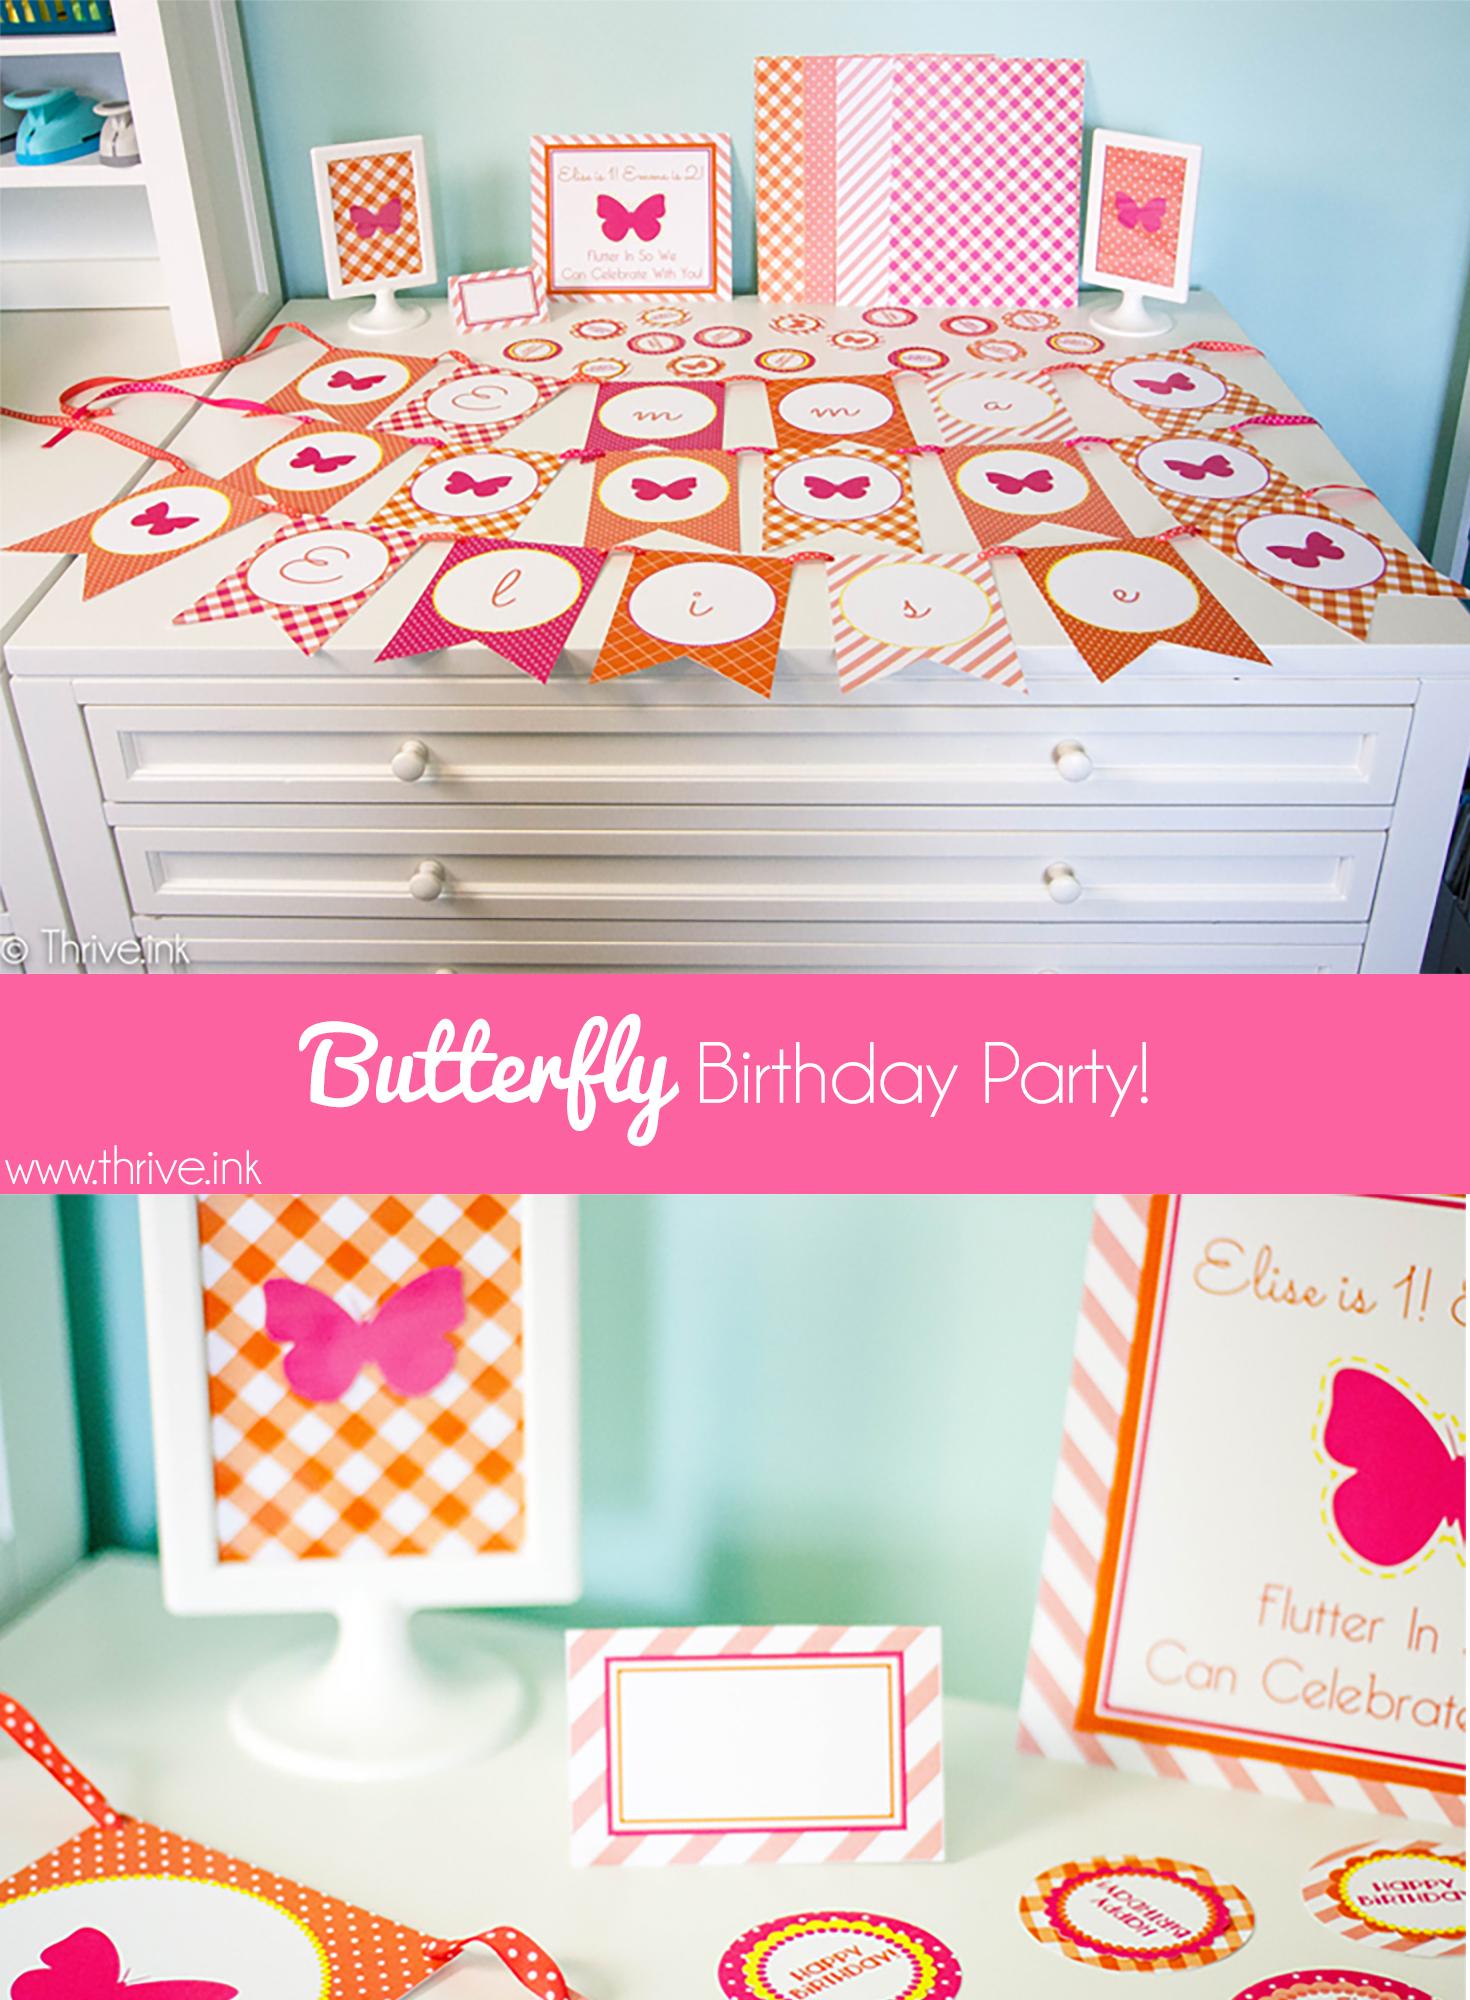 butterflypinterestpic.jpg